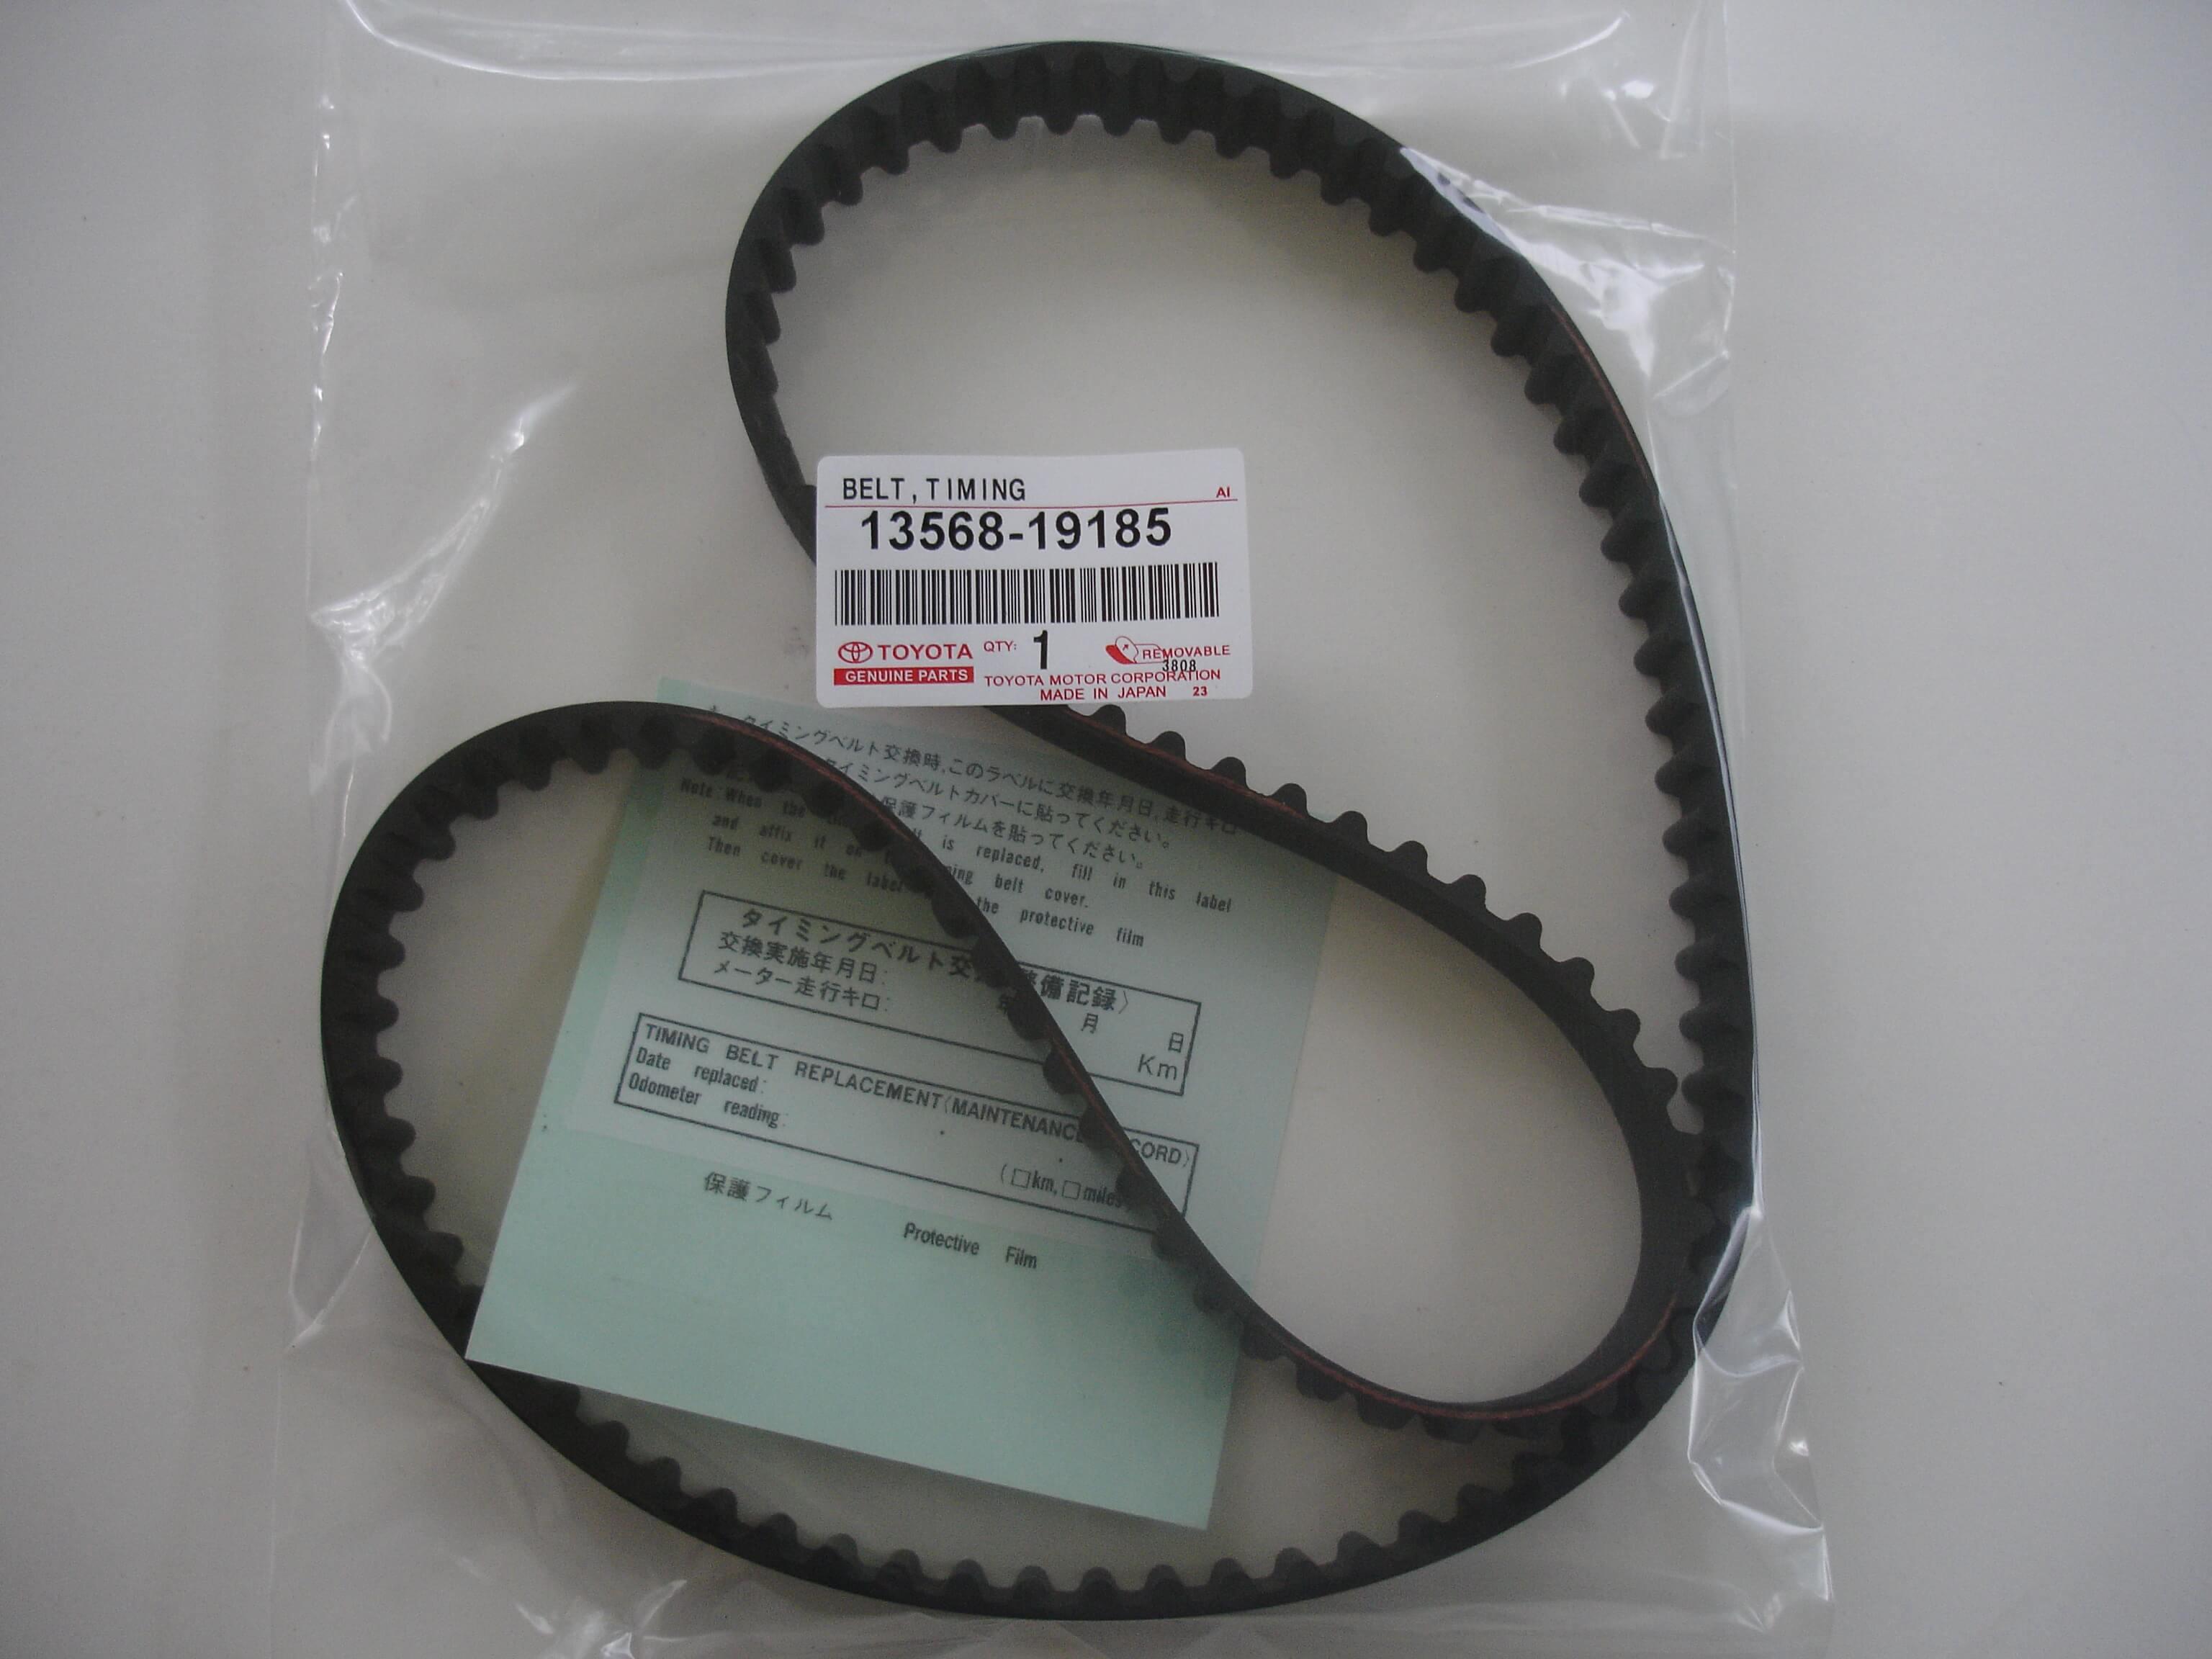 Toyota Oem 4a Ge Timing Belt 13568 19185 Blacktop 20 Valve 95 98 Product Ae86